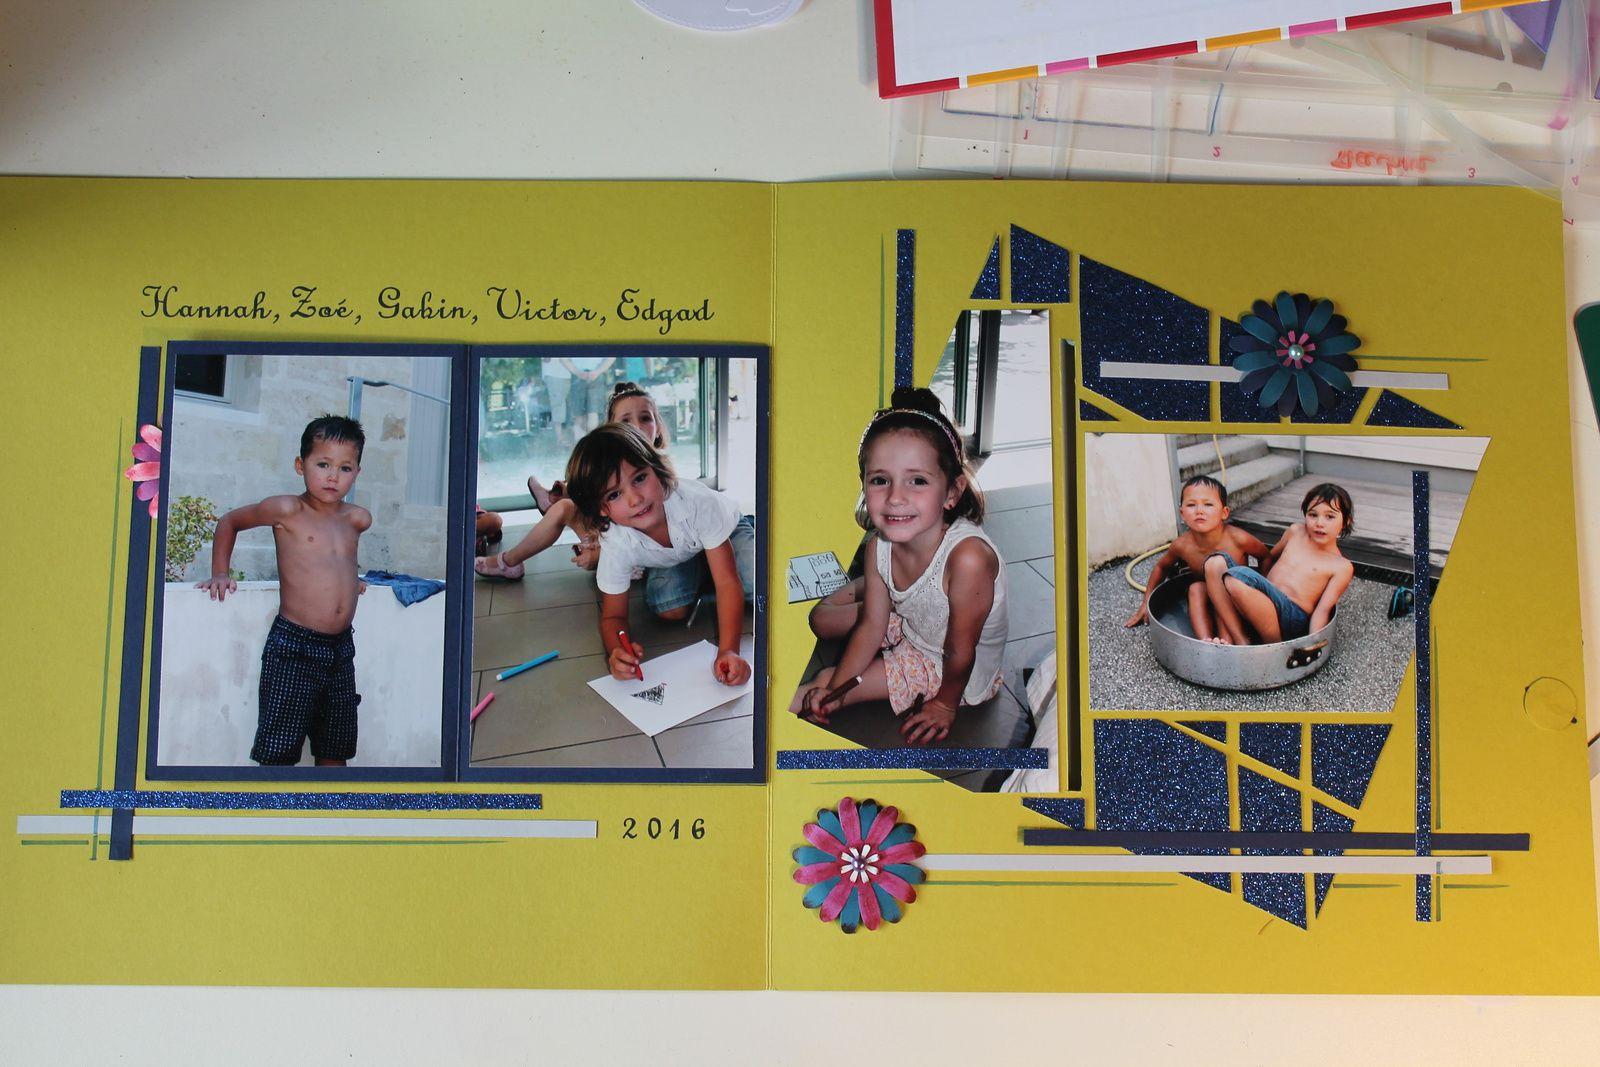 Victor, Zoé, Edgard, Gabin, et Hannah Août 2016